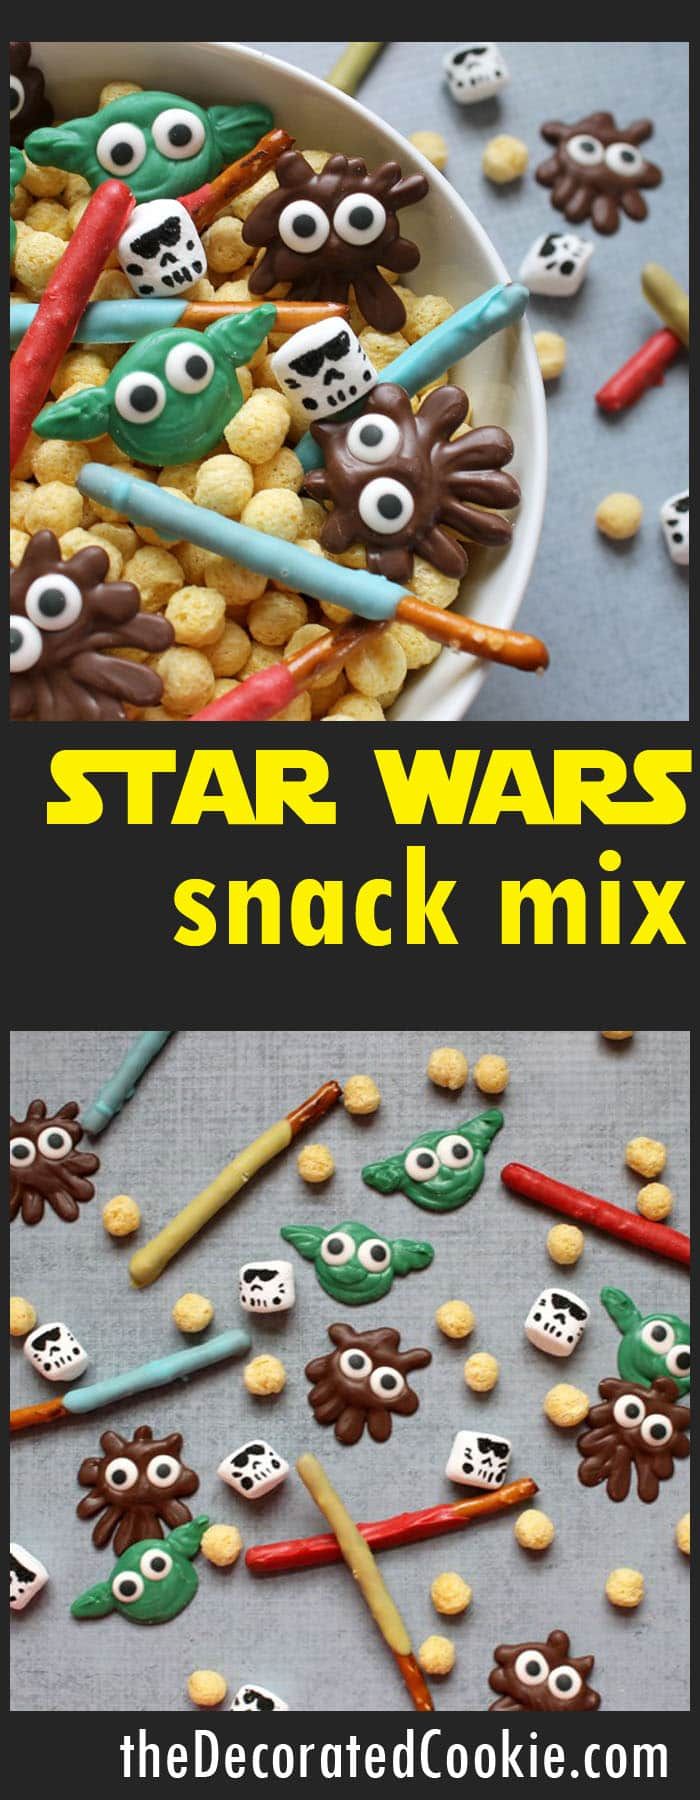 Star Wars snack mix